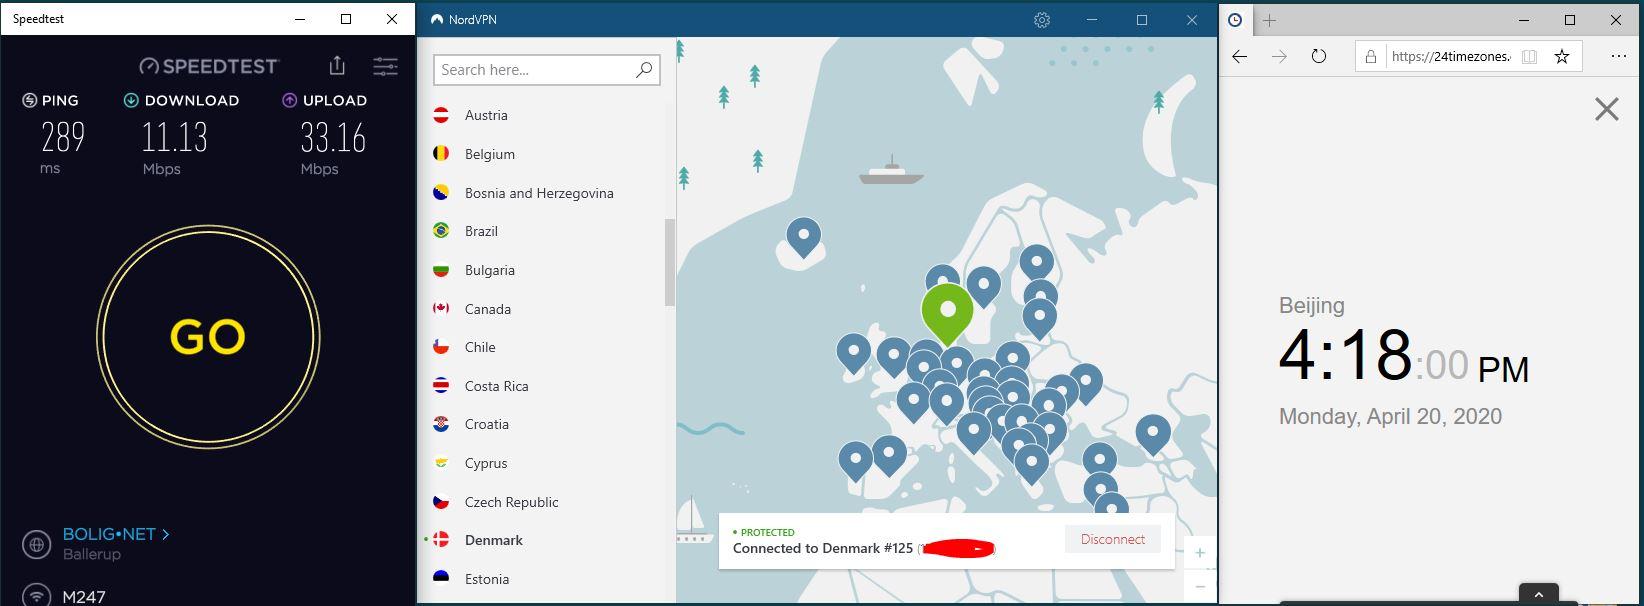 Windows10 NordVPN 混淆协议关闭 Denmark #125 中国VPN 翻墙 科学上网 SpeedTest测速-20200420